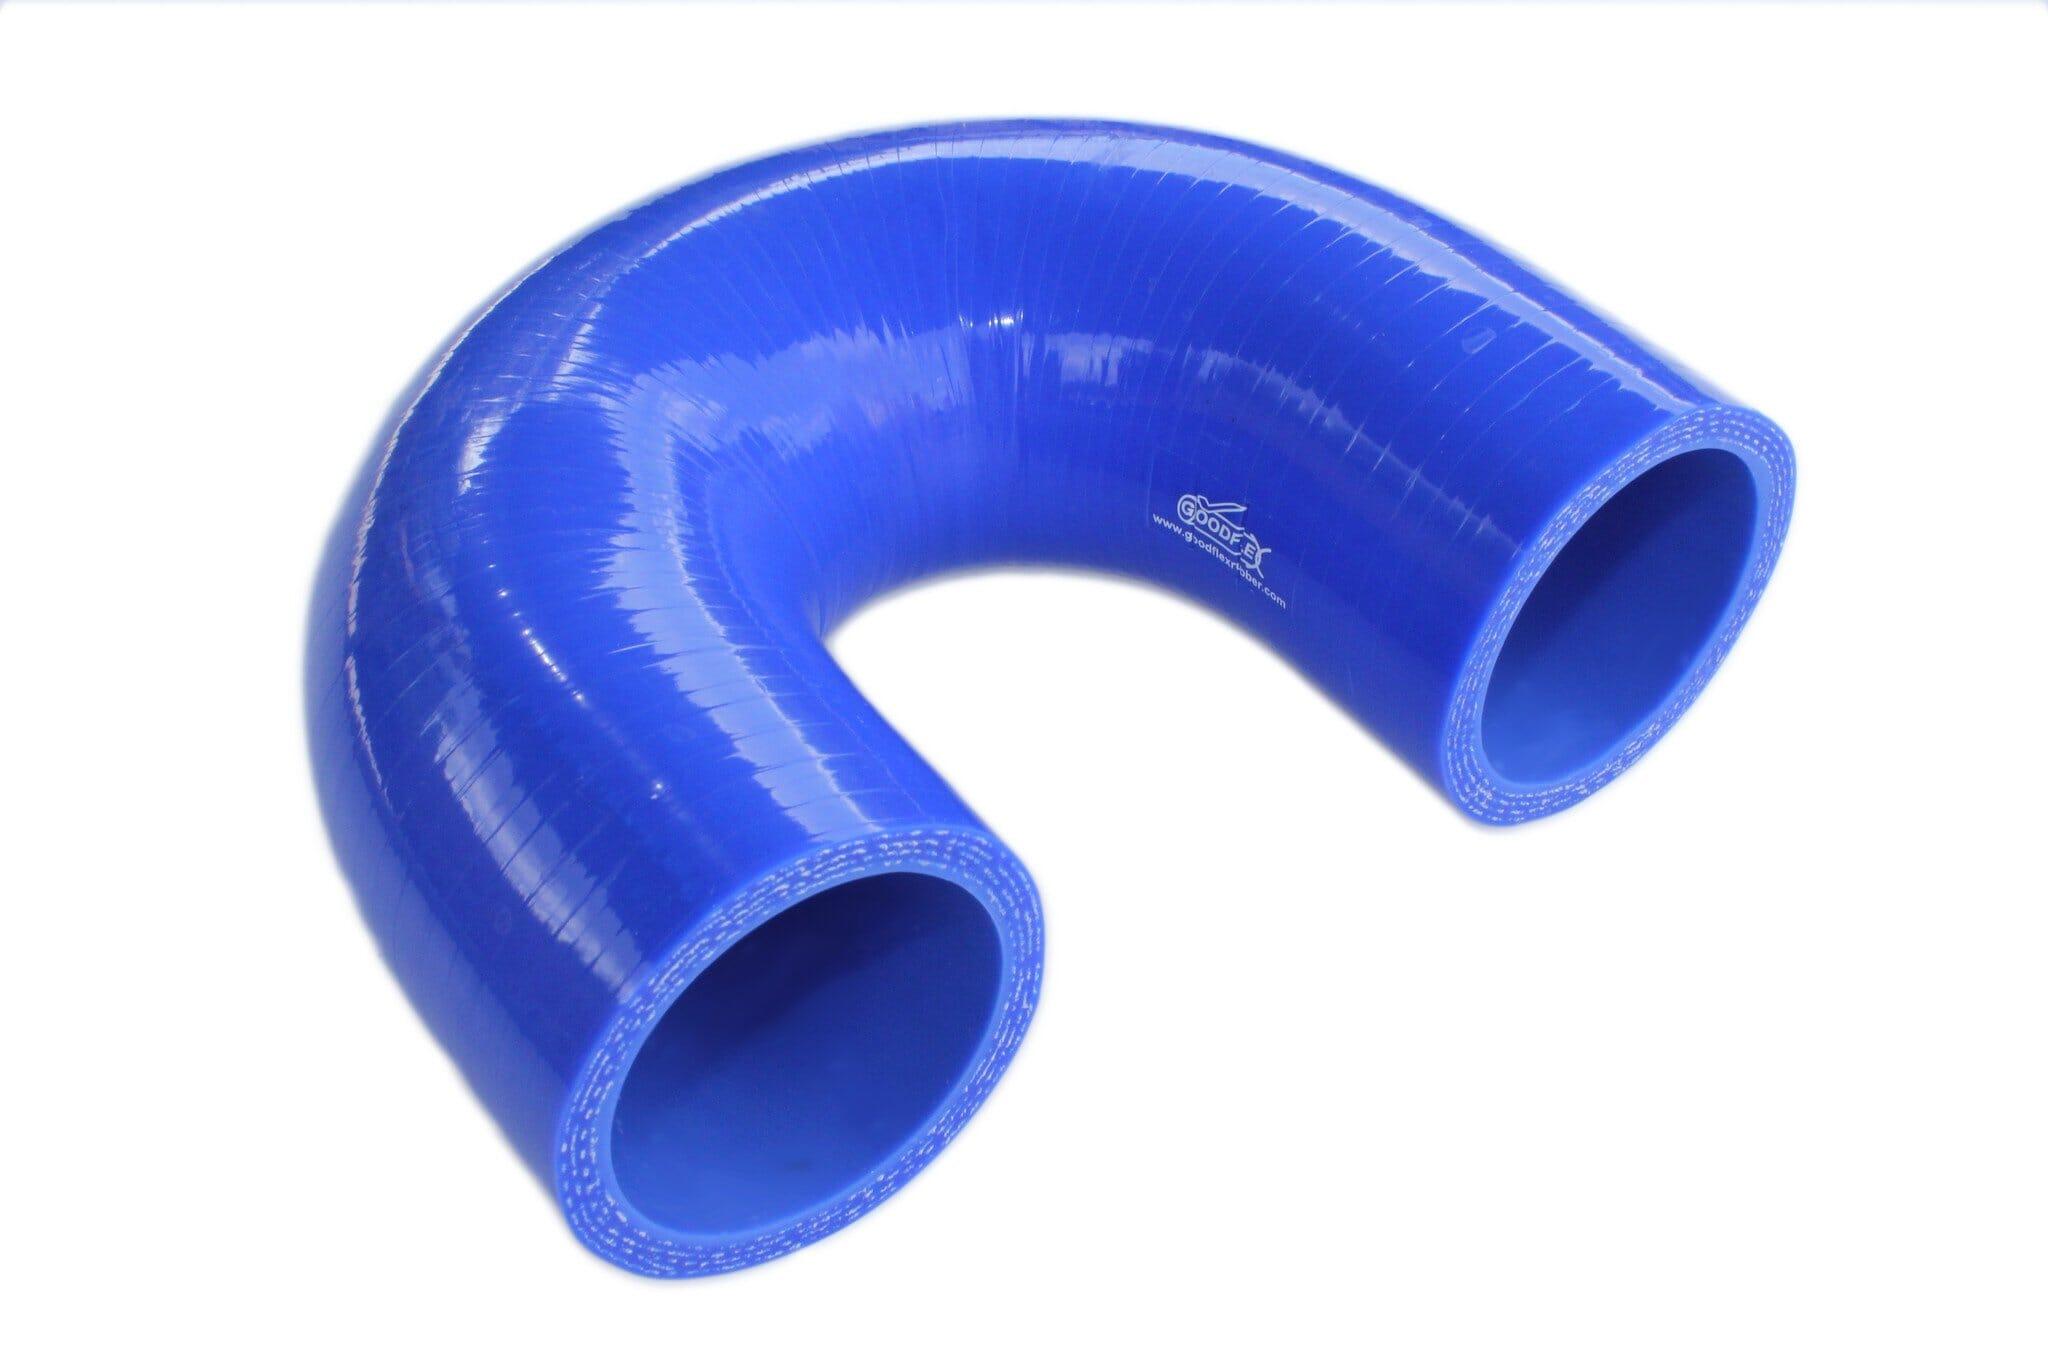 Blue_U_Bend_Lay_Down_a5ef619a-9658-424a-ad5f-18731f4a3e54